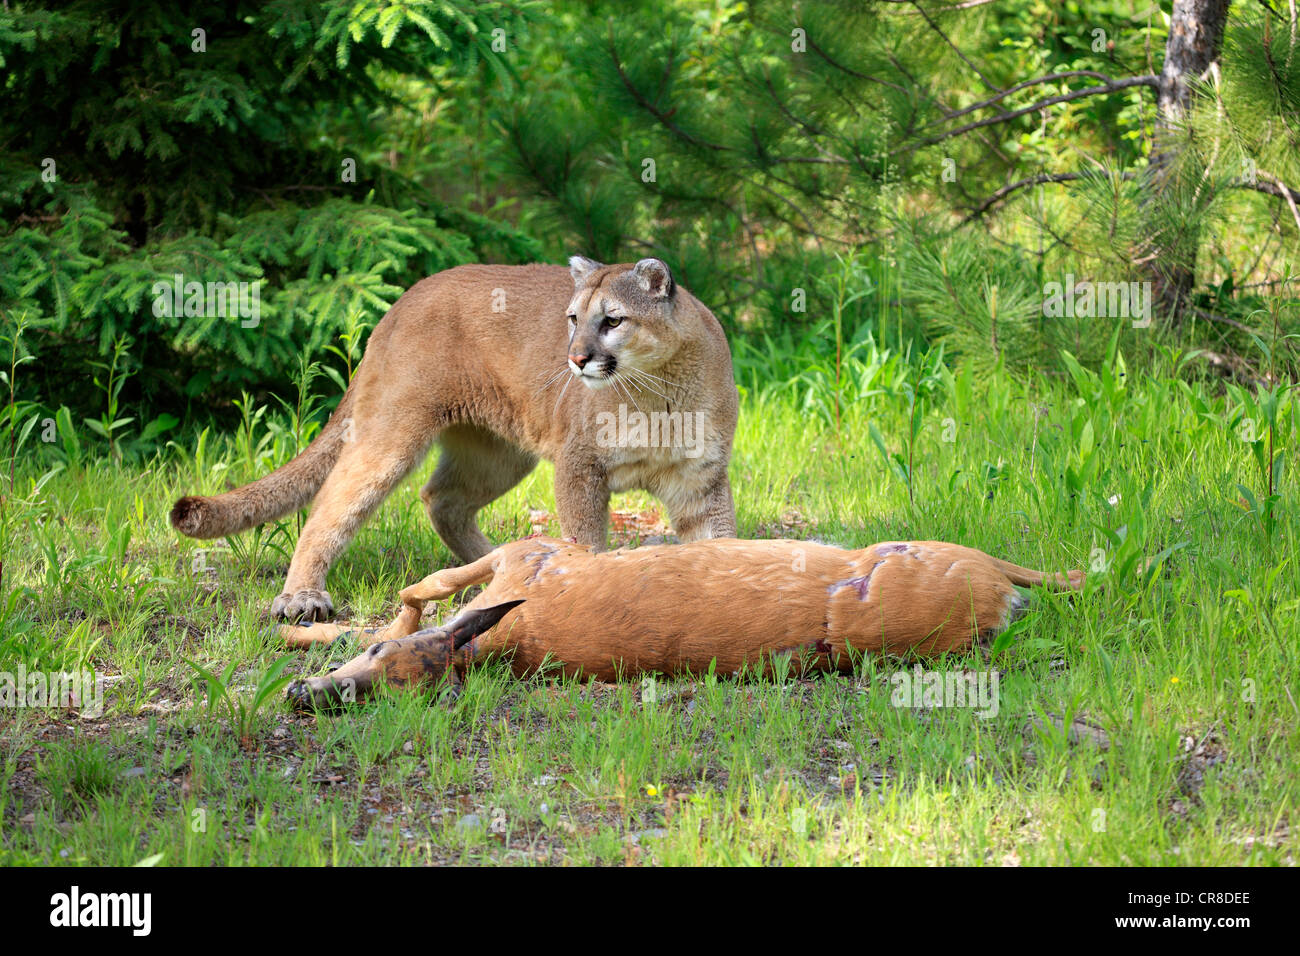 Cougar or Puma (Puma concolor, Felis concolor), adult with prey, Minnesota, USA - Stock Image